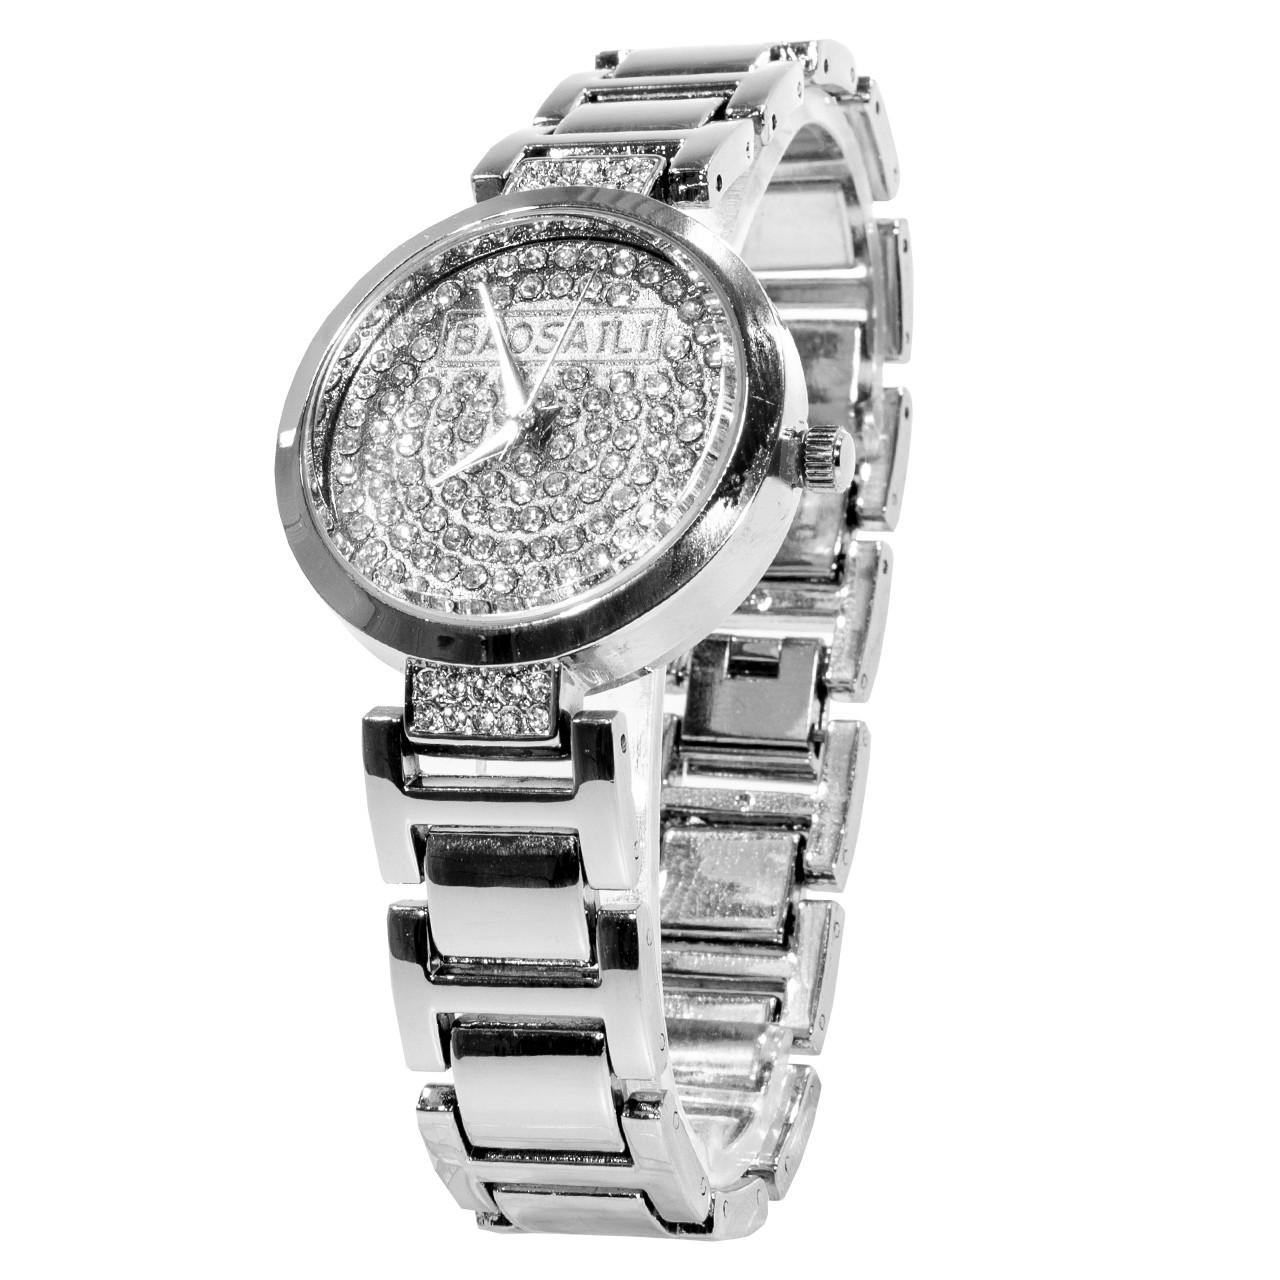 Годинник Baosaili KJ805 Silver (3081-8929)